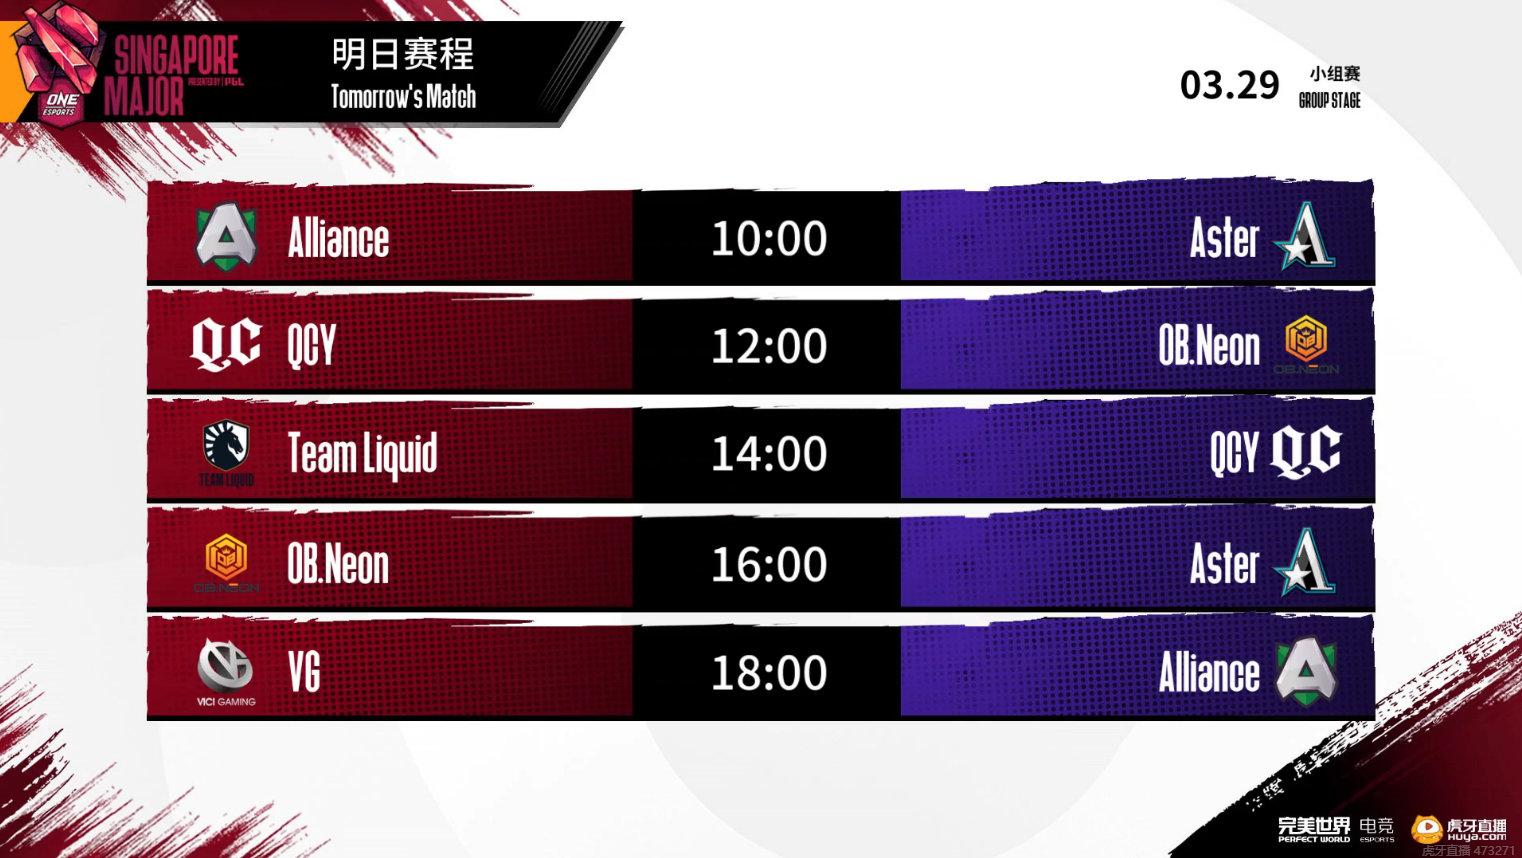 《DOTA2》新加坡Major外卡赛结束 两支中国队携手晋级